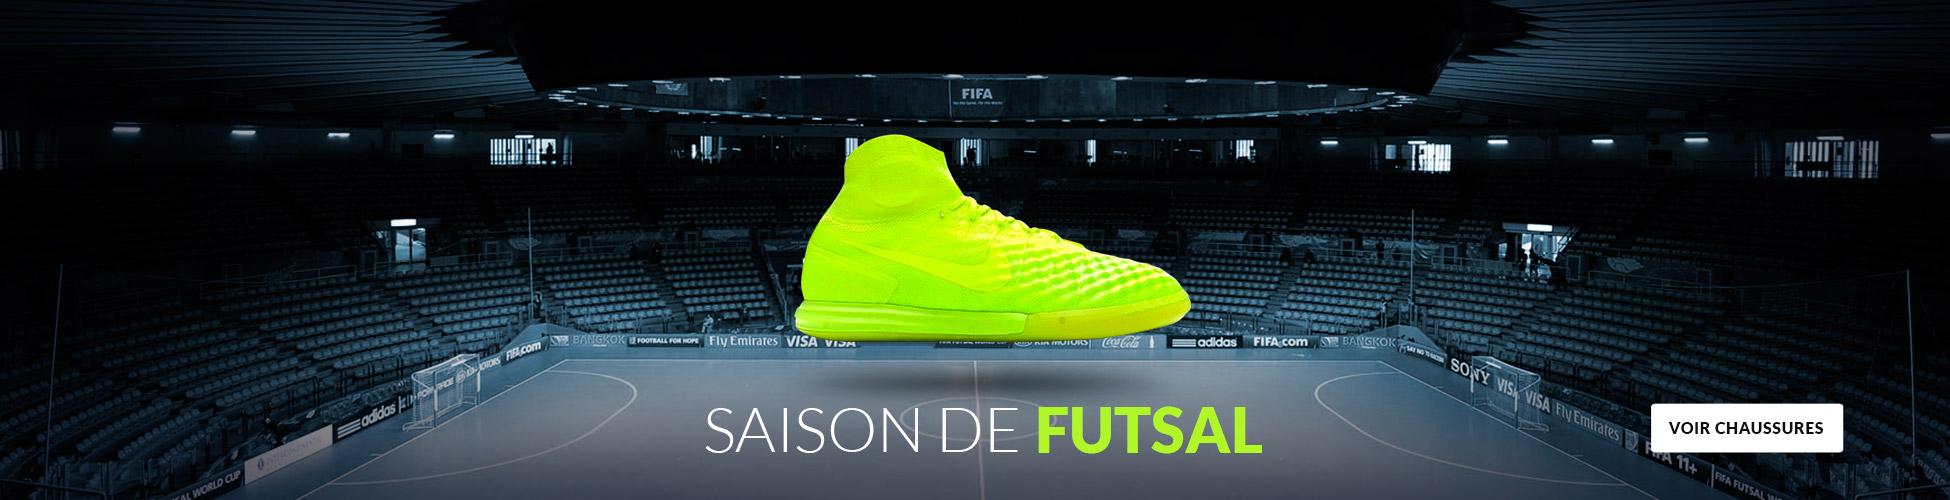 Temporada Futsal FR